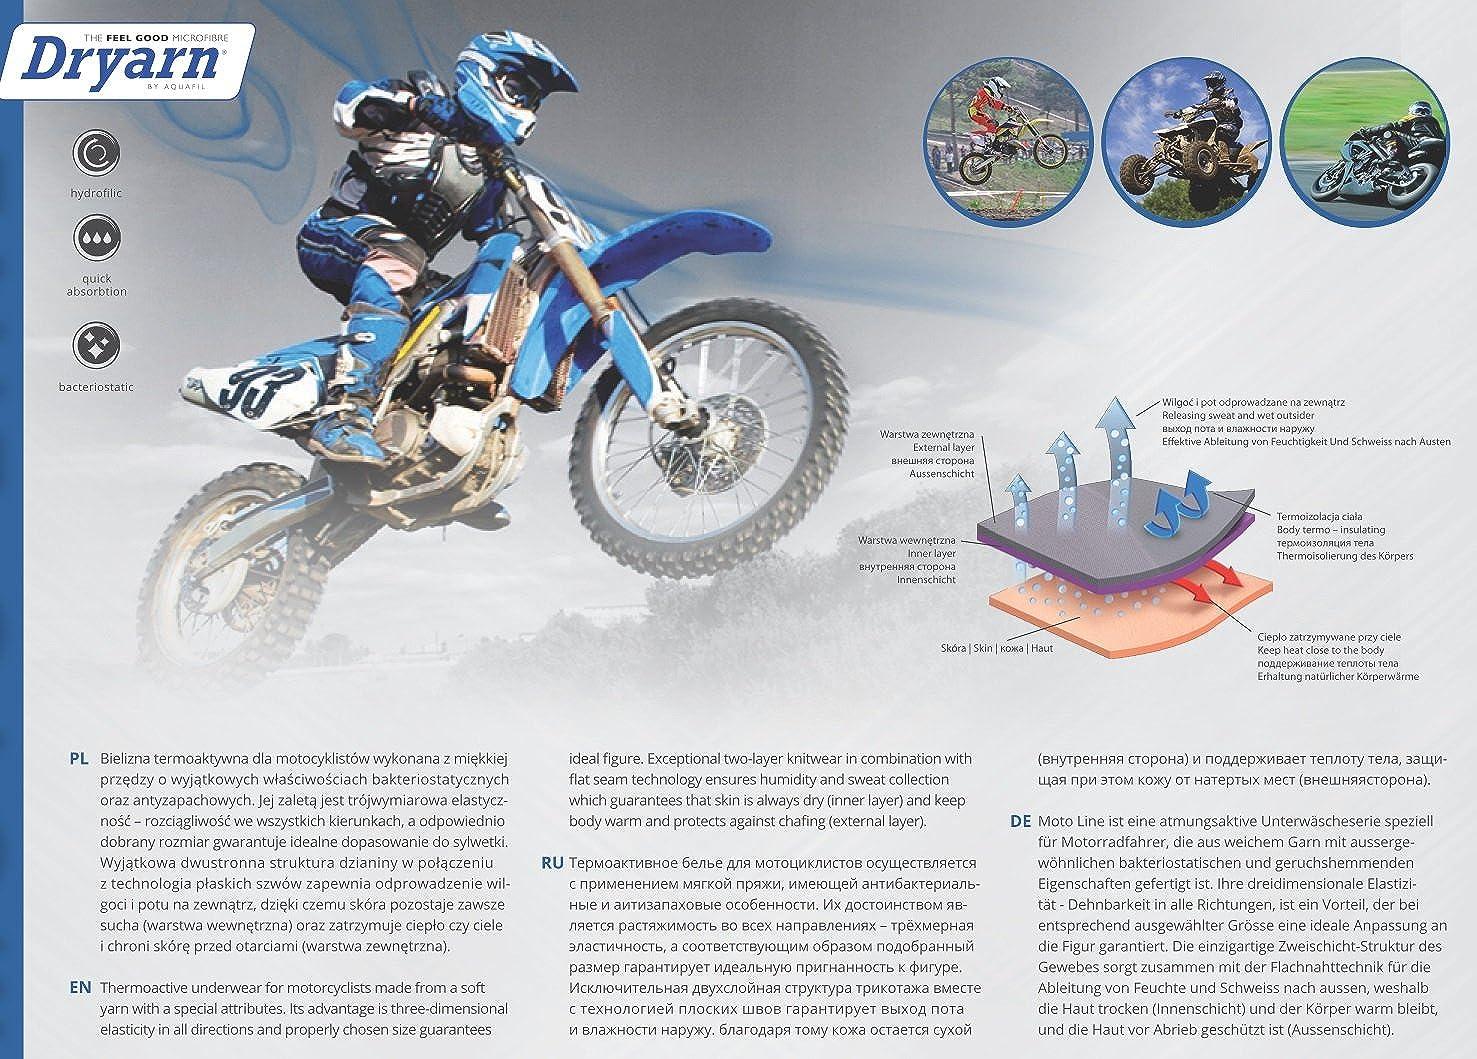 TESPOL funktionale Balaclava Sturmhaube Sturmmaske Motorradmaske Thermoaktiv Unisex Made in Italy